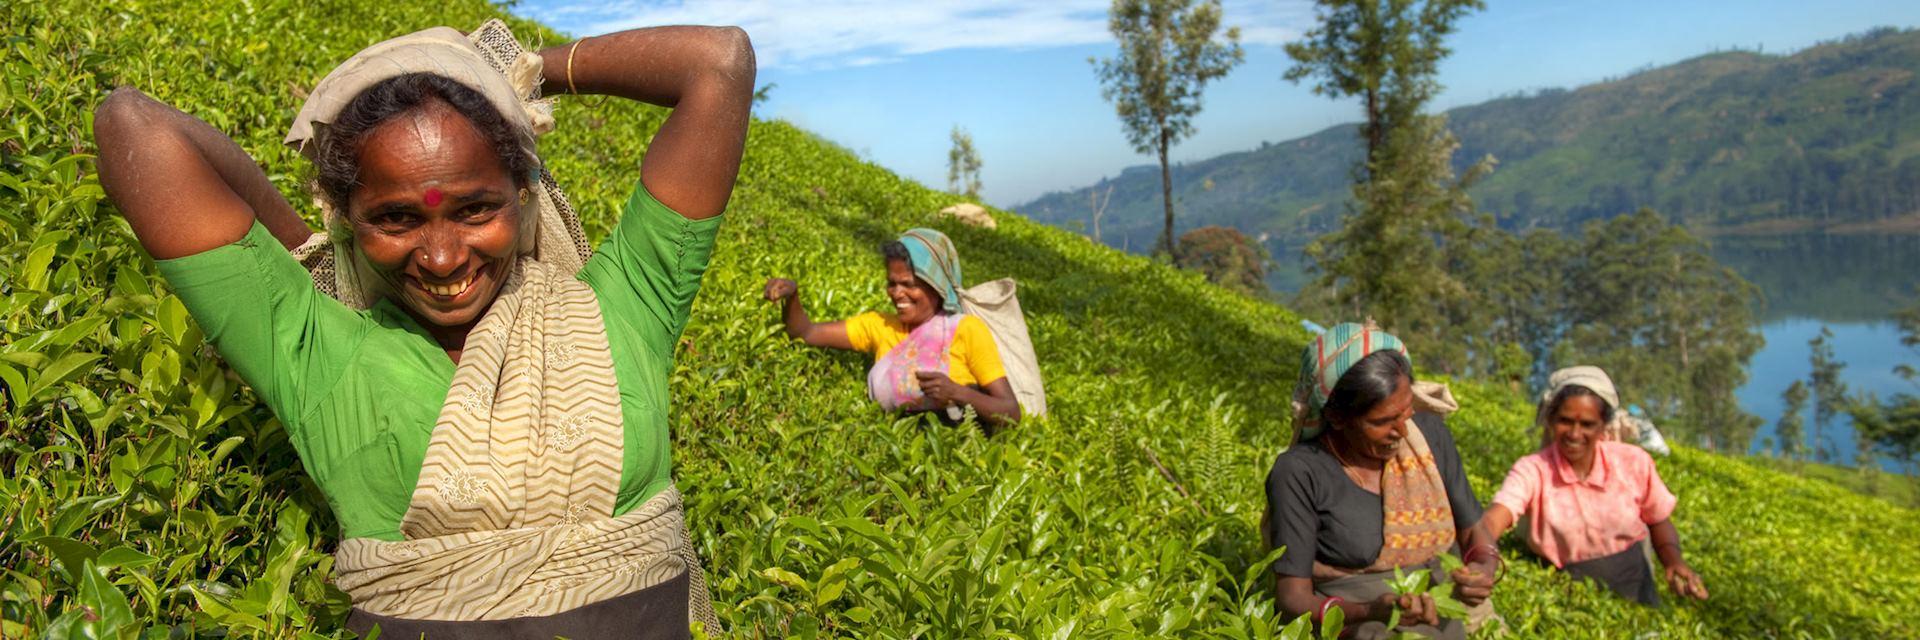 Tea plantation workers in Nuwara Eliya